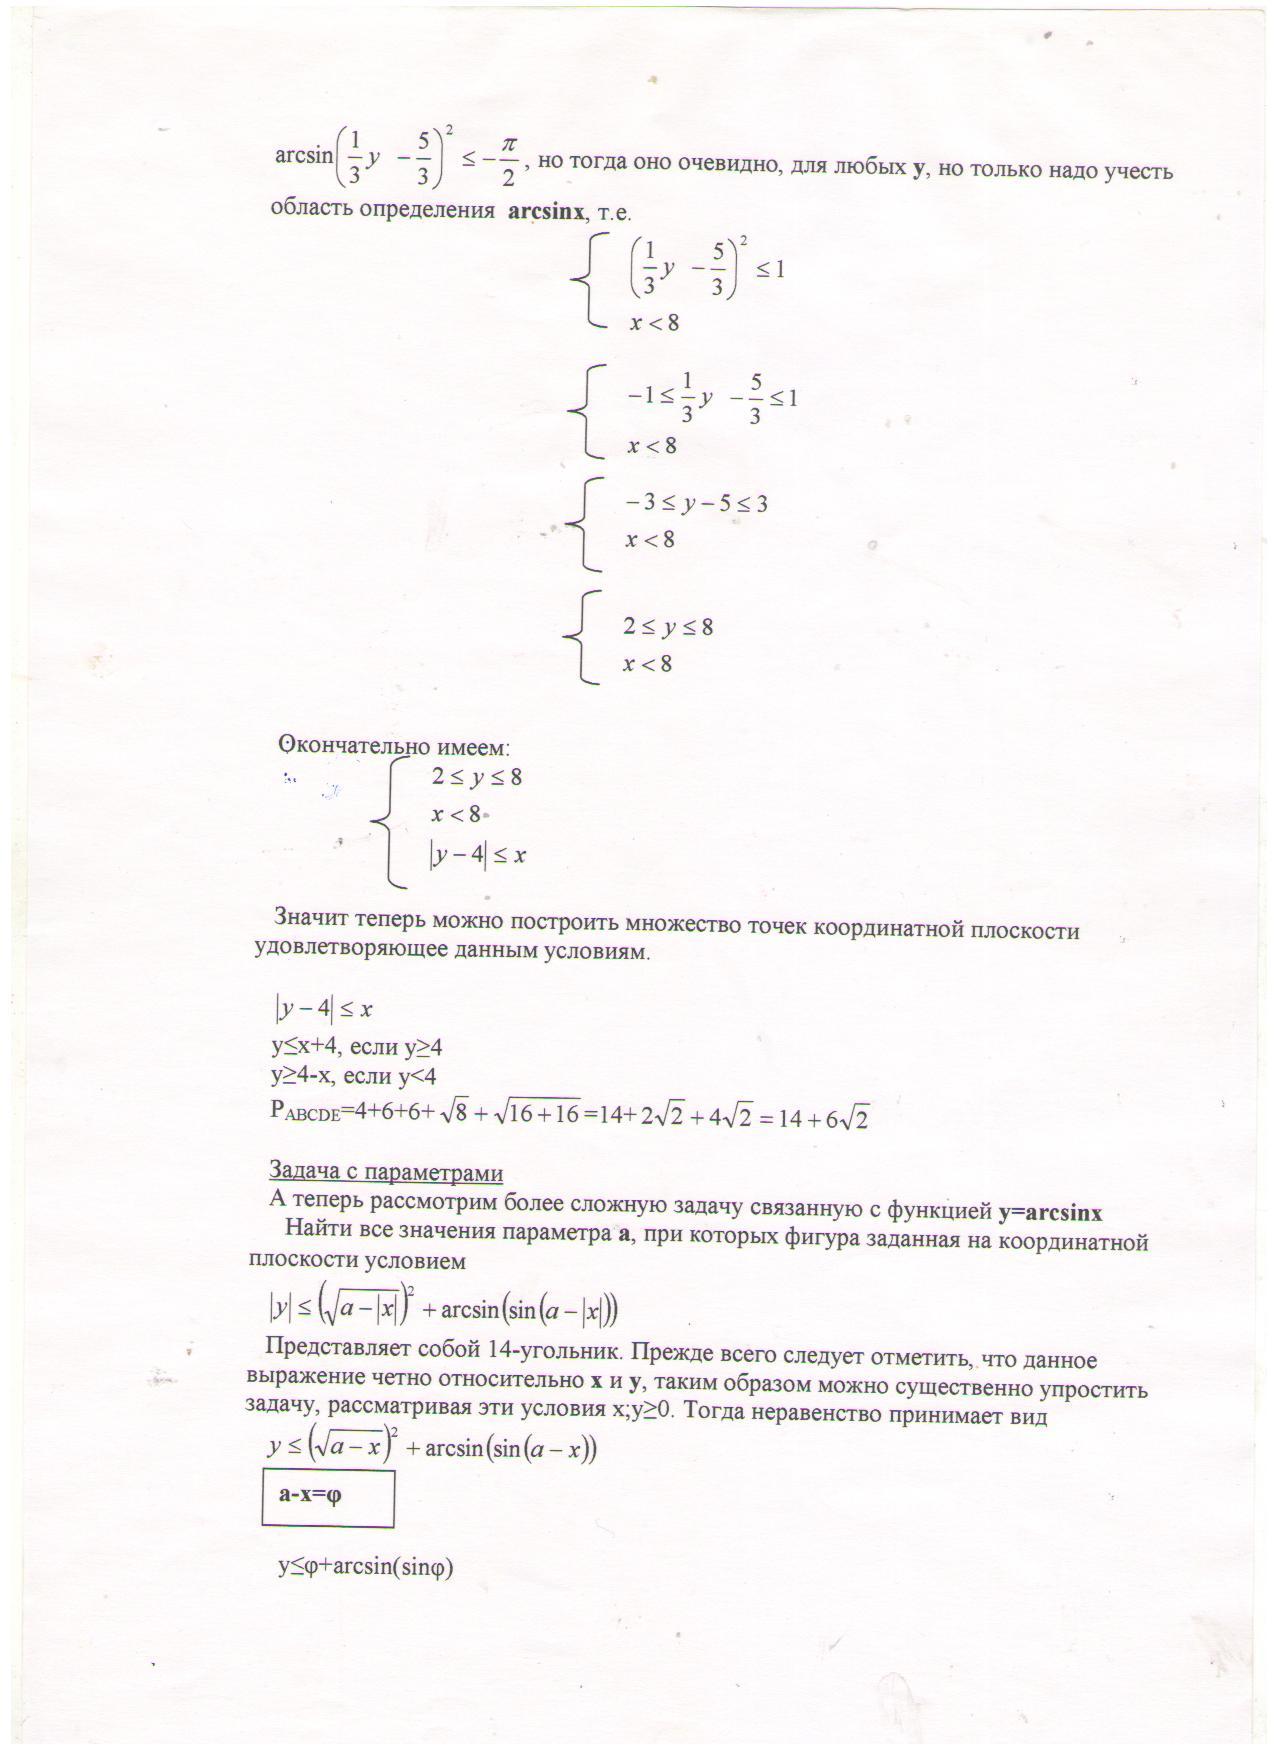 C:\Documents and Settings\23\Рабочий стол\урок\первый\2.jpg